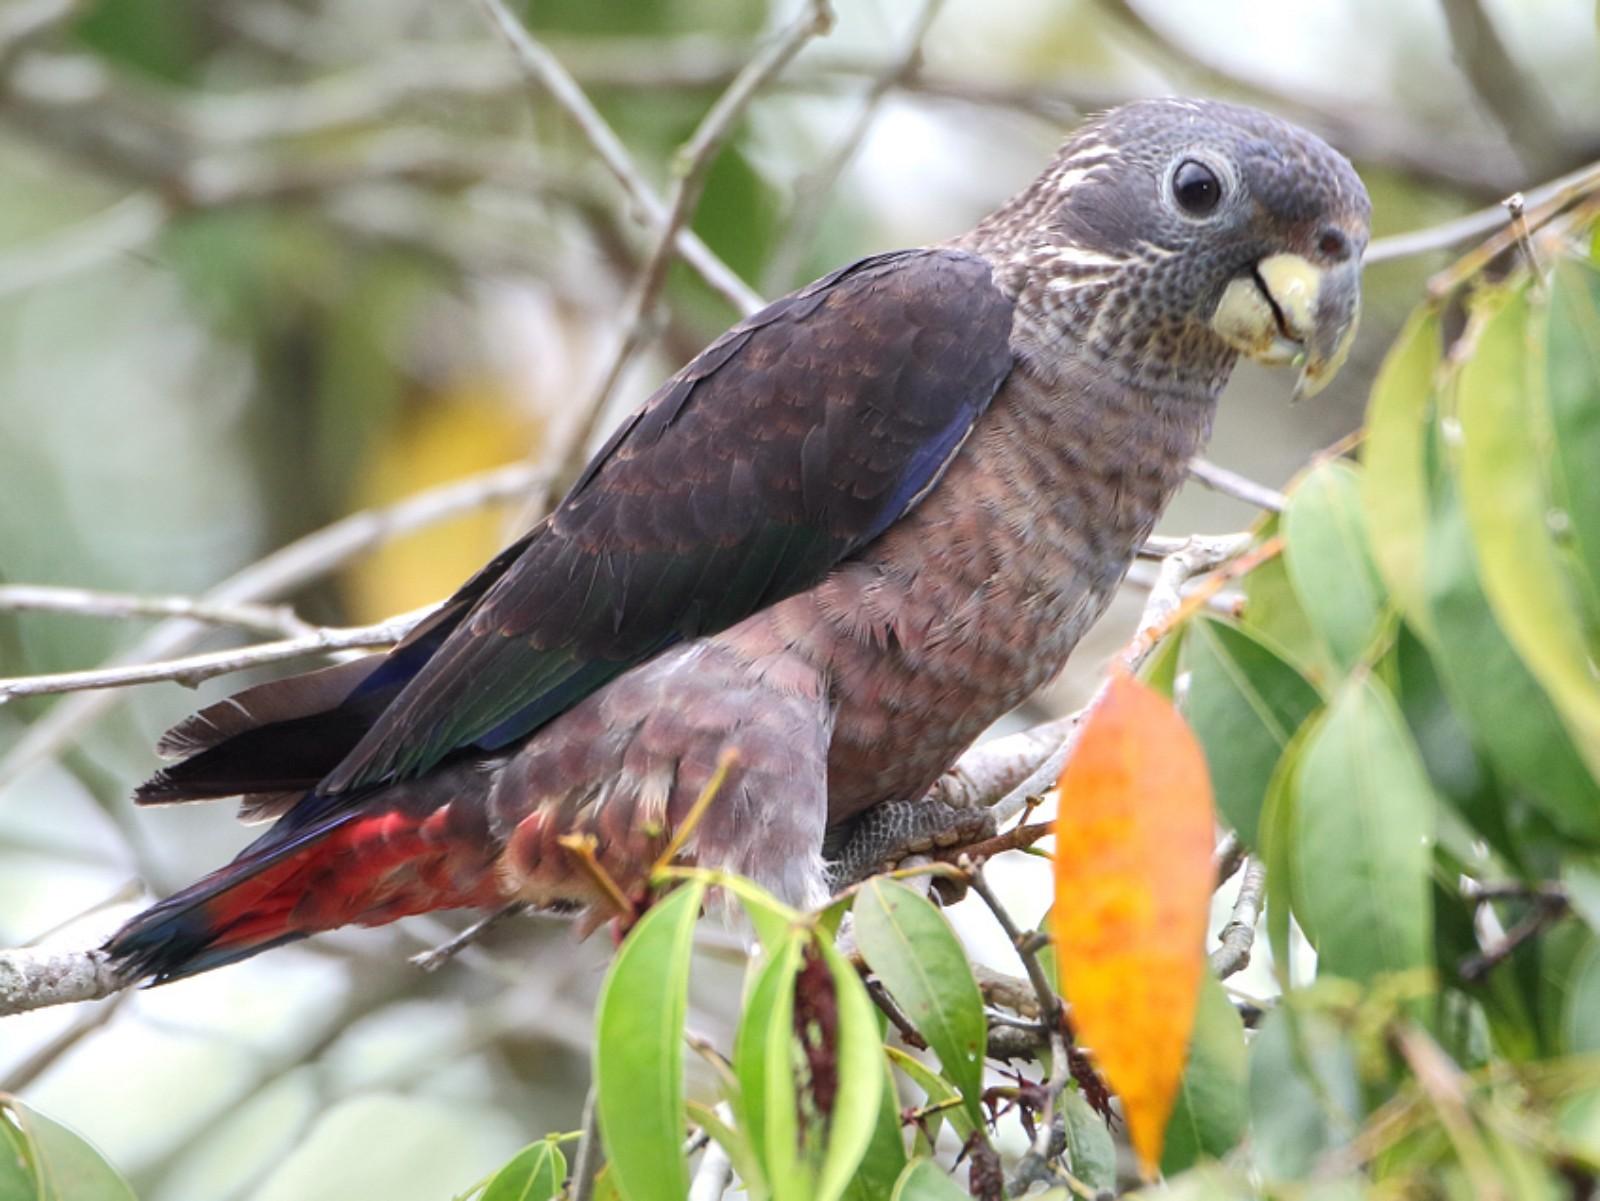 Dusky Parrot - Anselmo  d'Affonseca